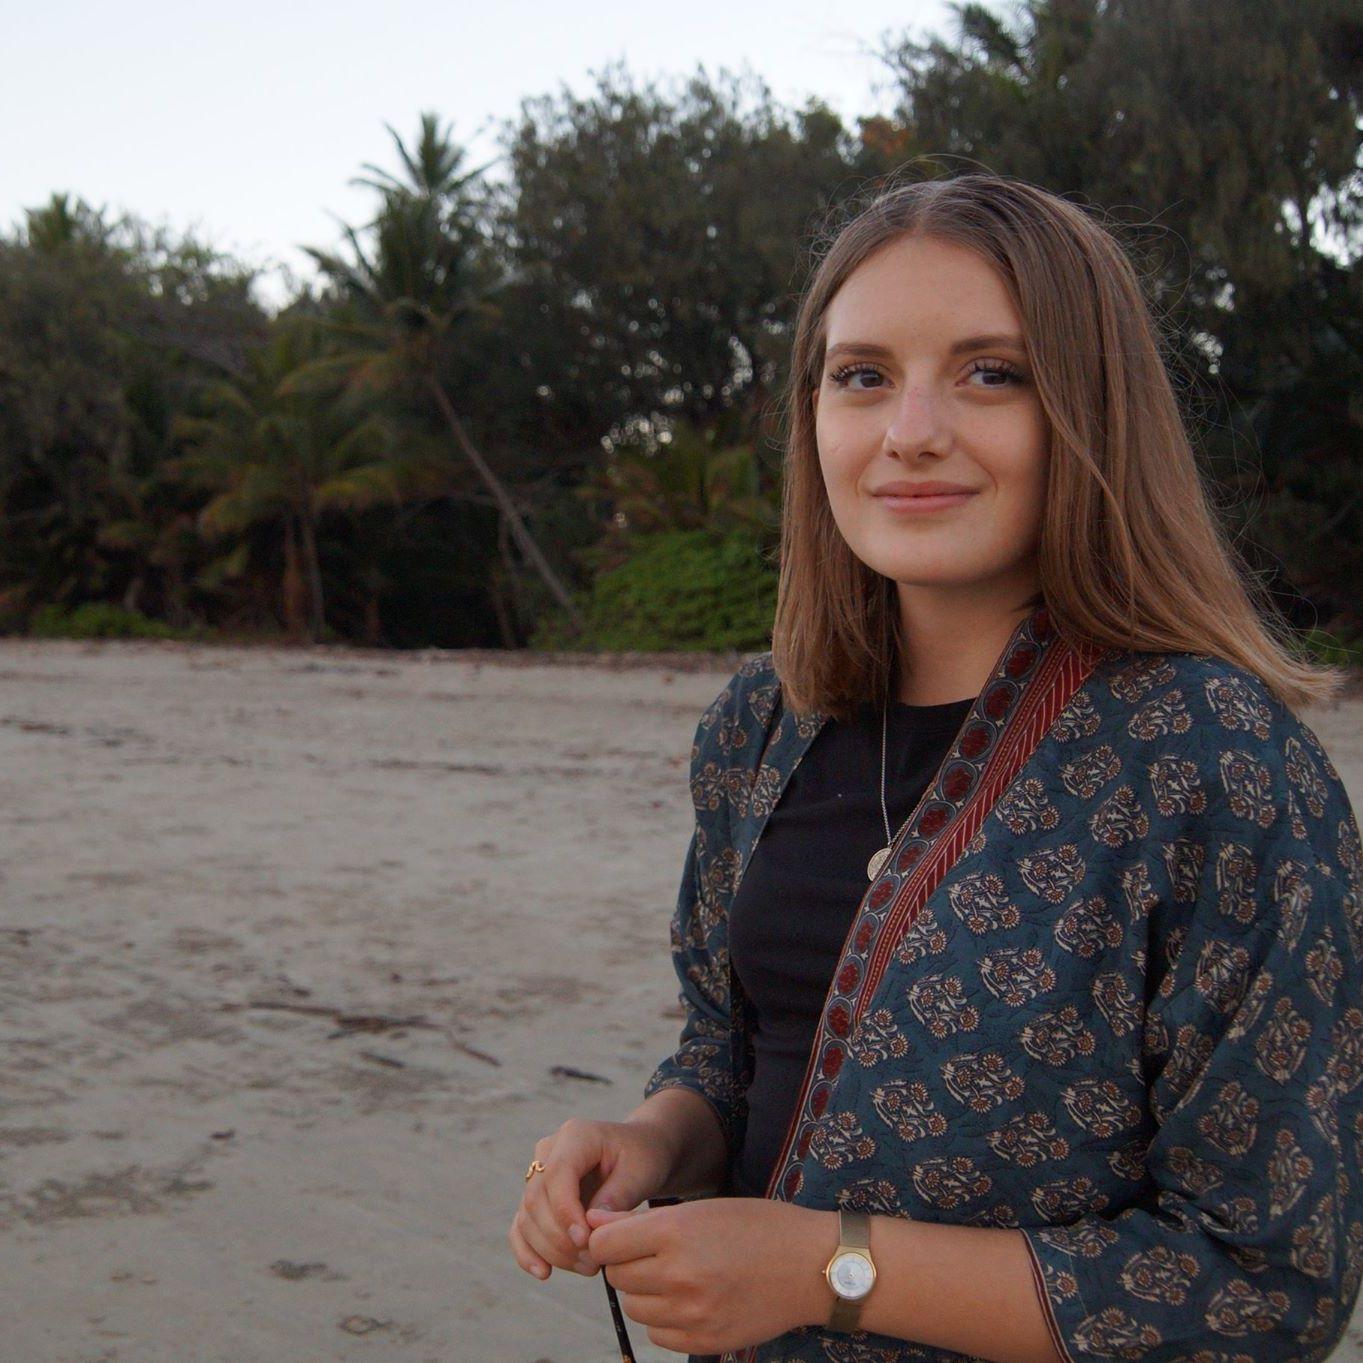 Karoline Lenius